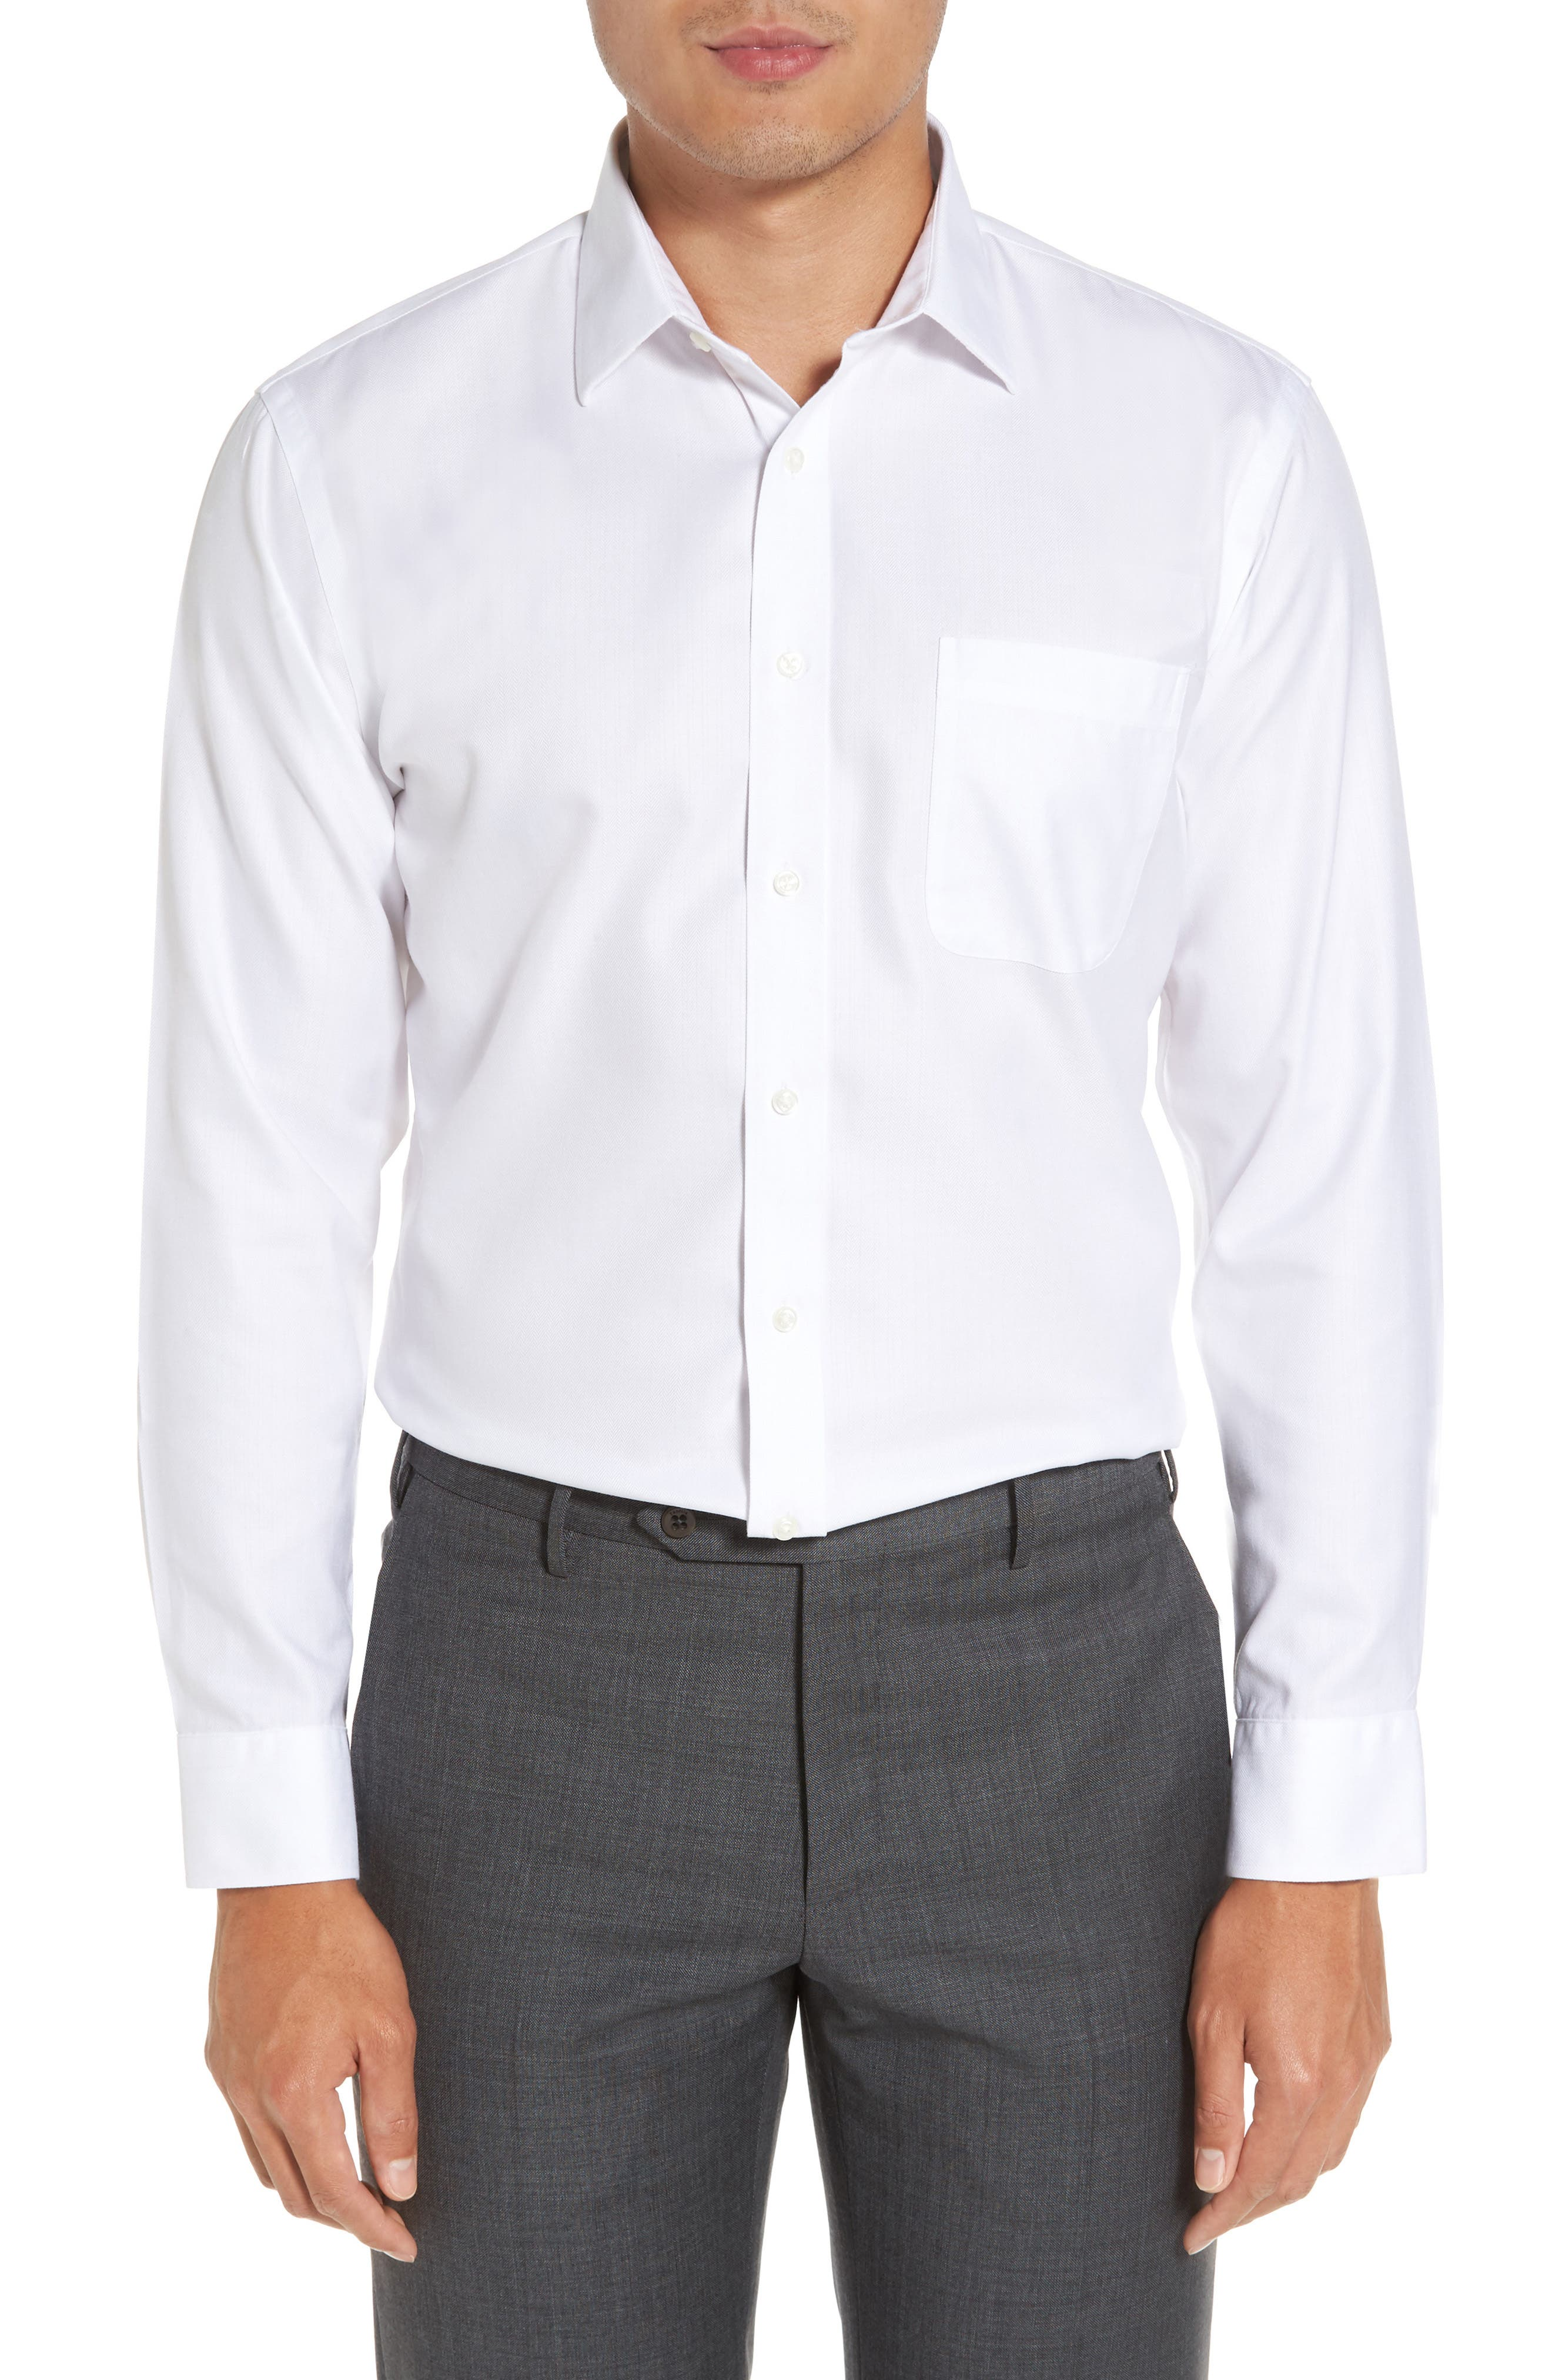 Nordstrom Shop Smartcare(TM) Trim Fit Herringbone Dress Shirt - White